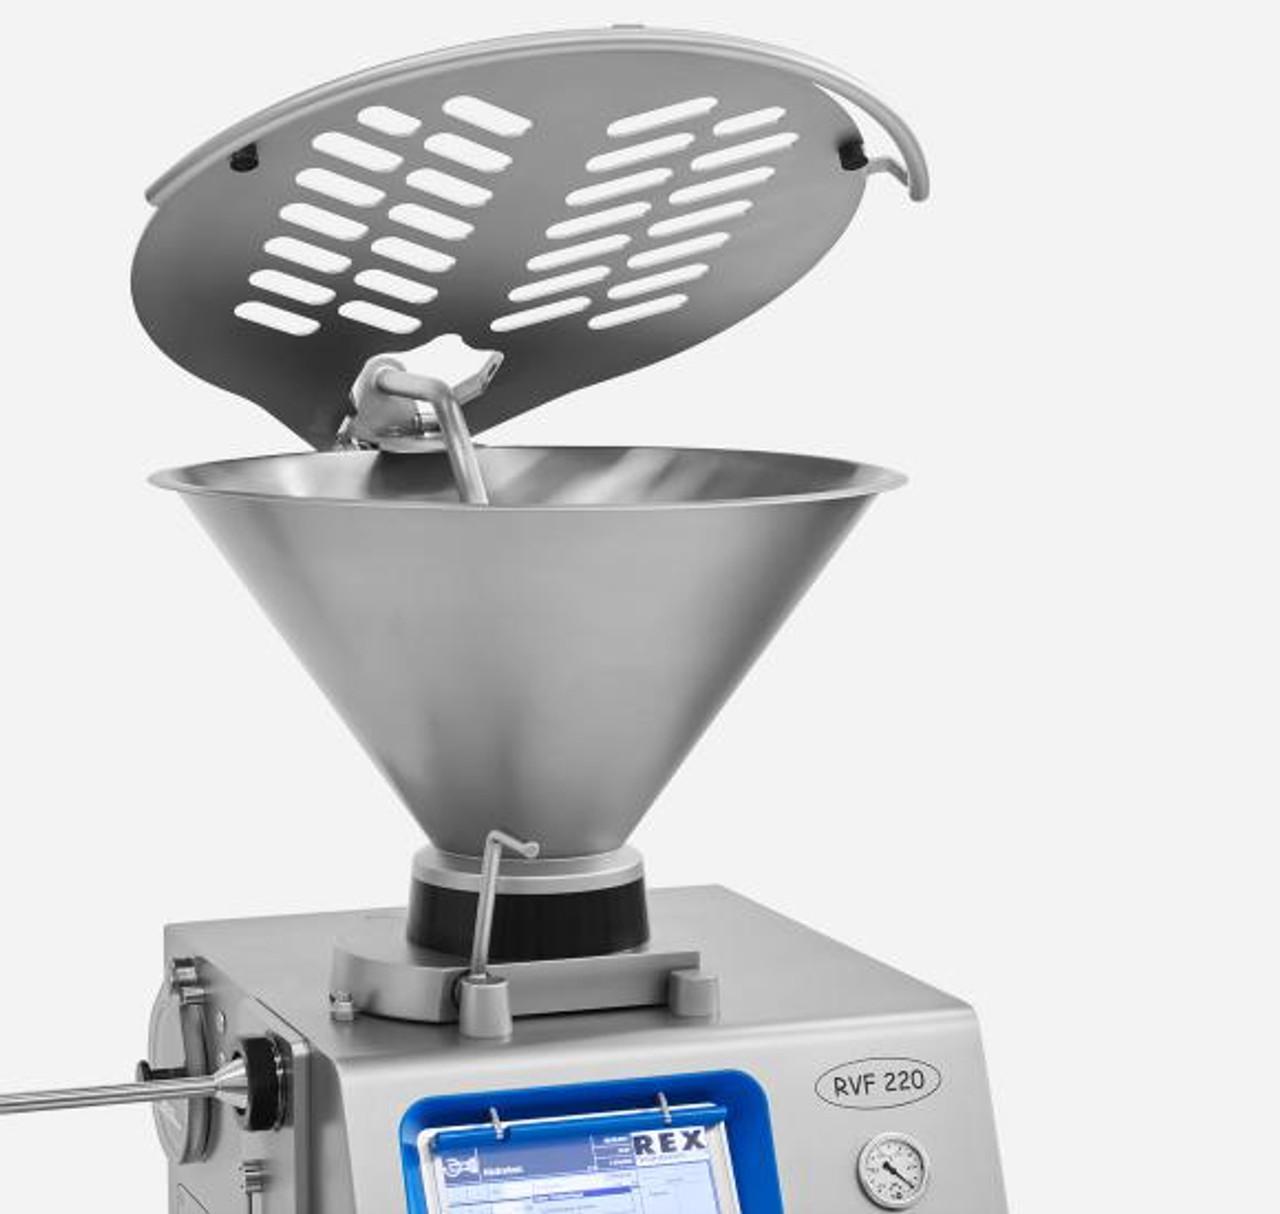 REX - RVF220 - Vacuum Stuffer w/ 50 Liter or 100 Liter  Hopper